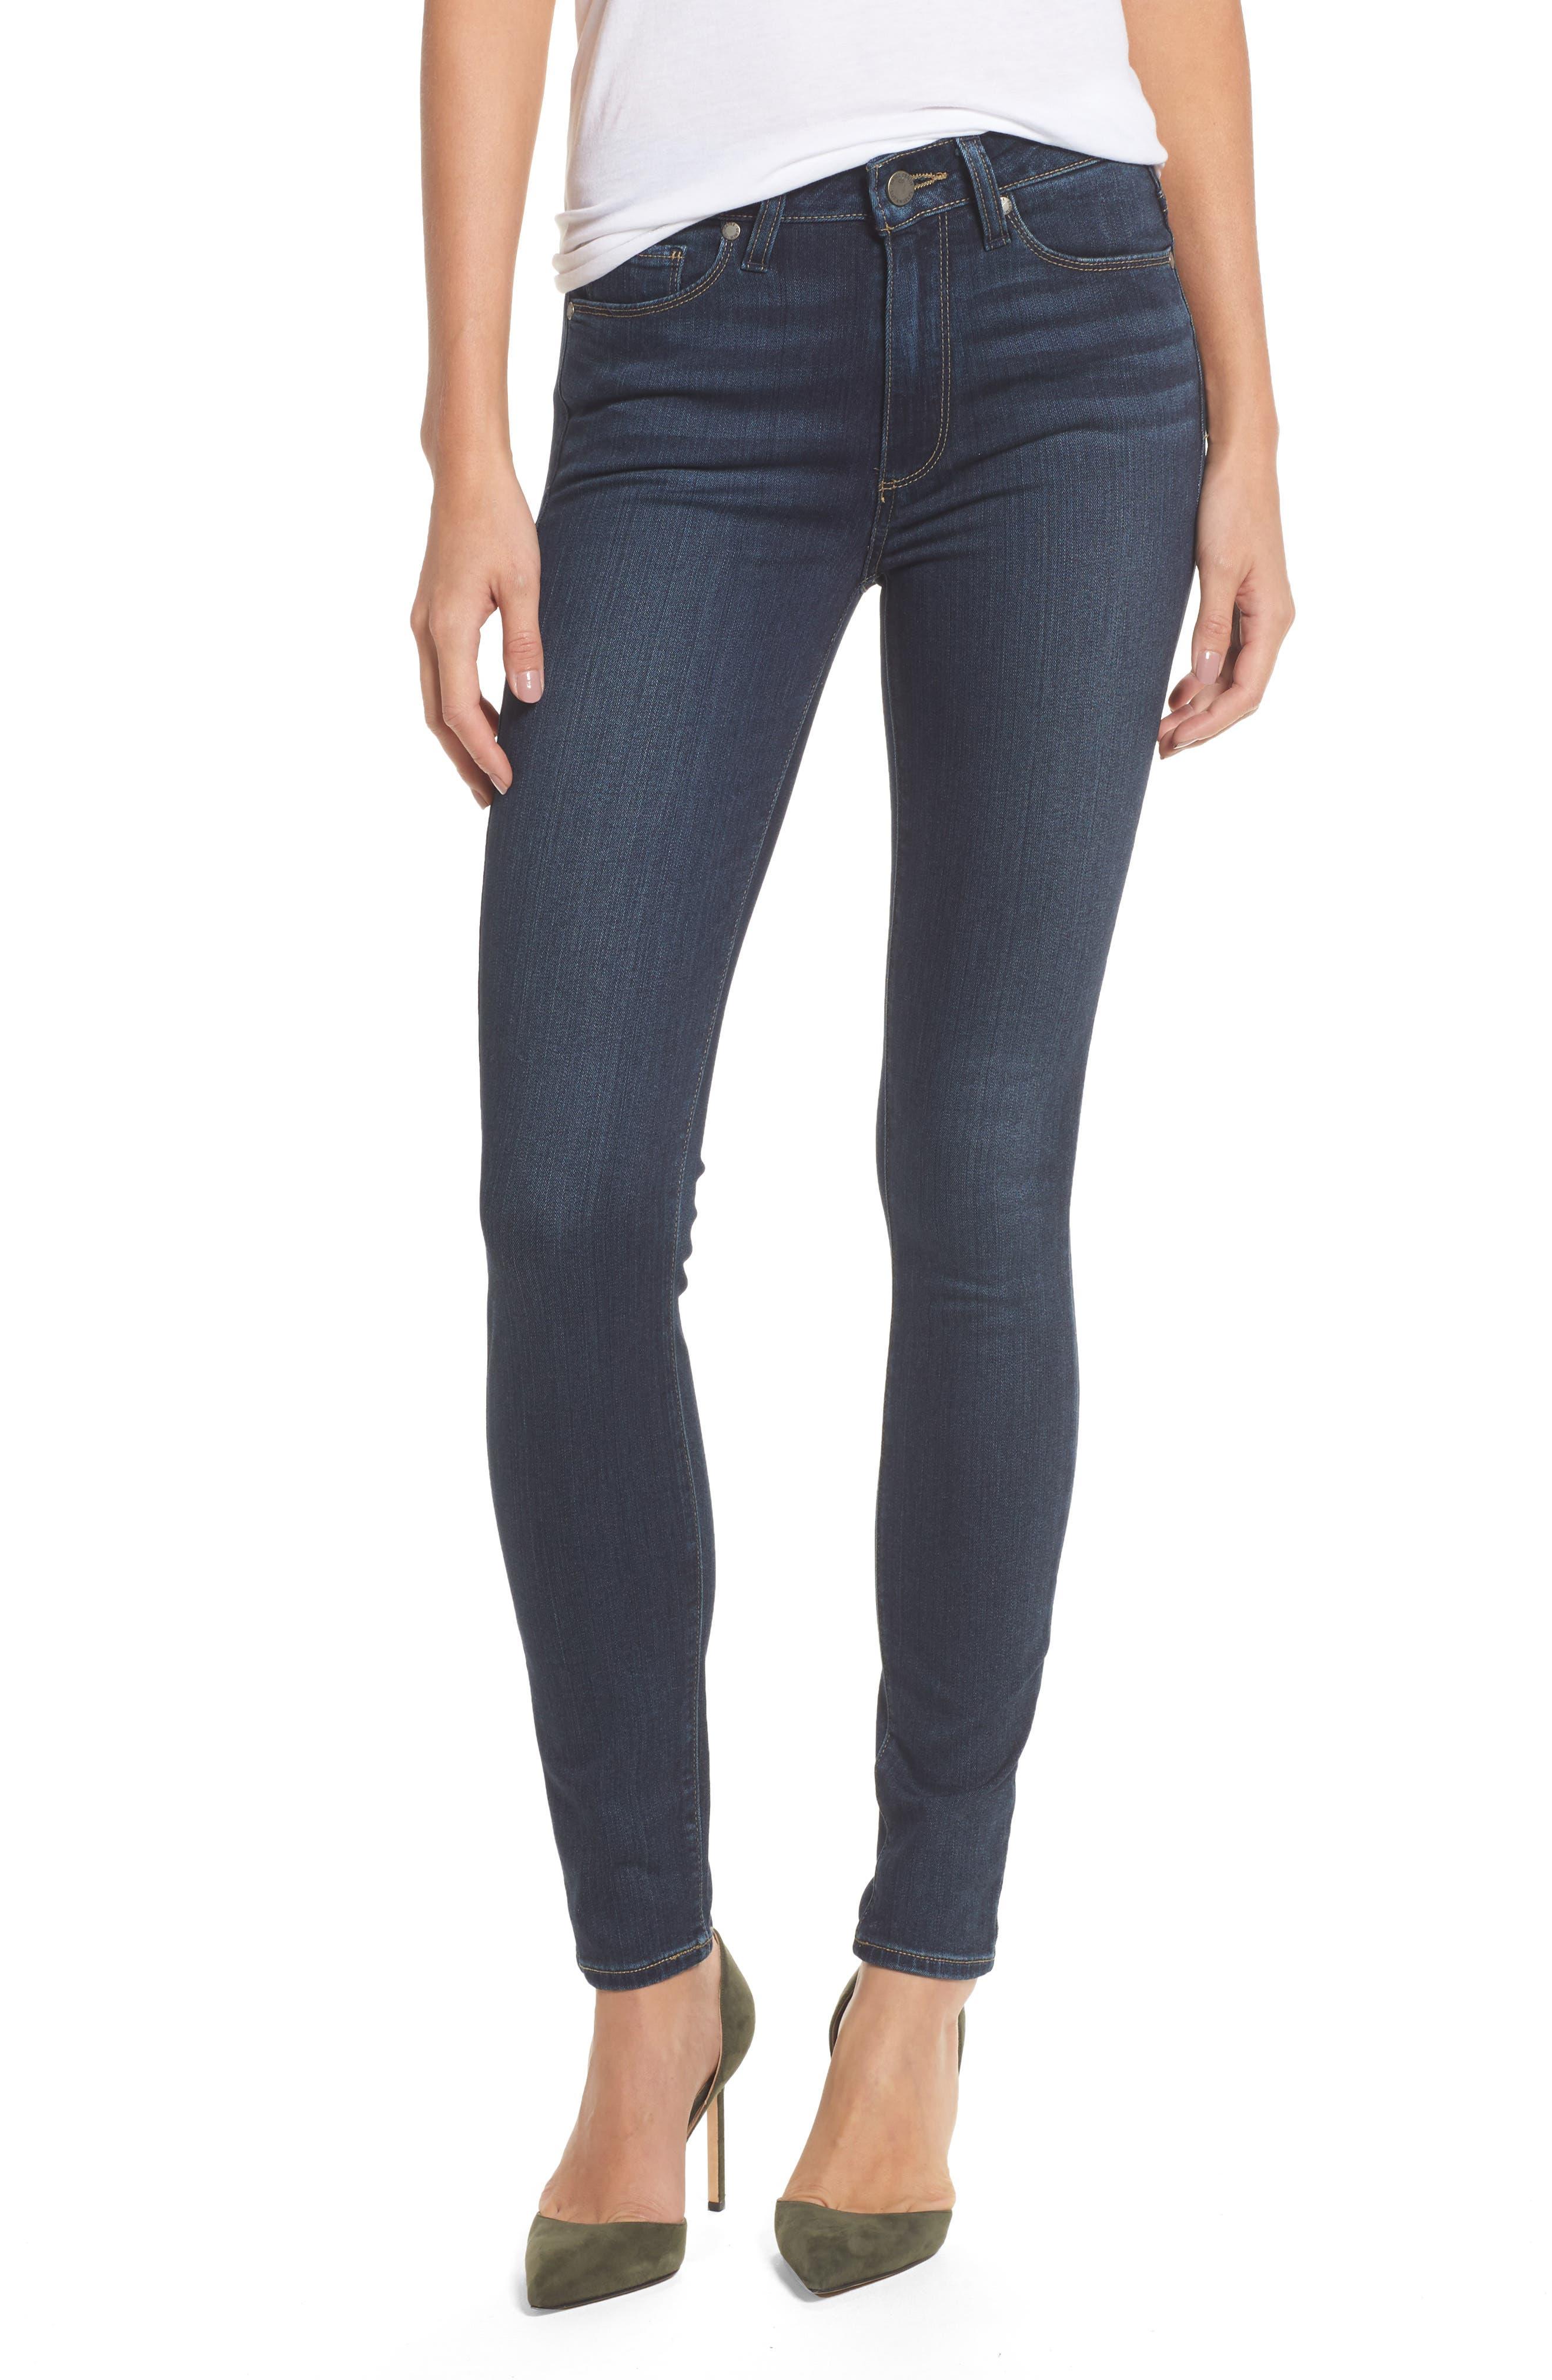 Main Image - PAIGE Transcend - Hoxton High Waist Ultra Skinny Jeans (Nottingham)